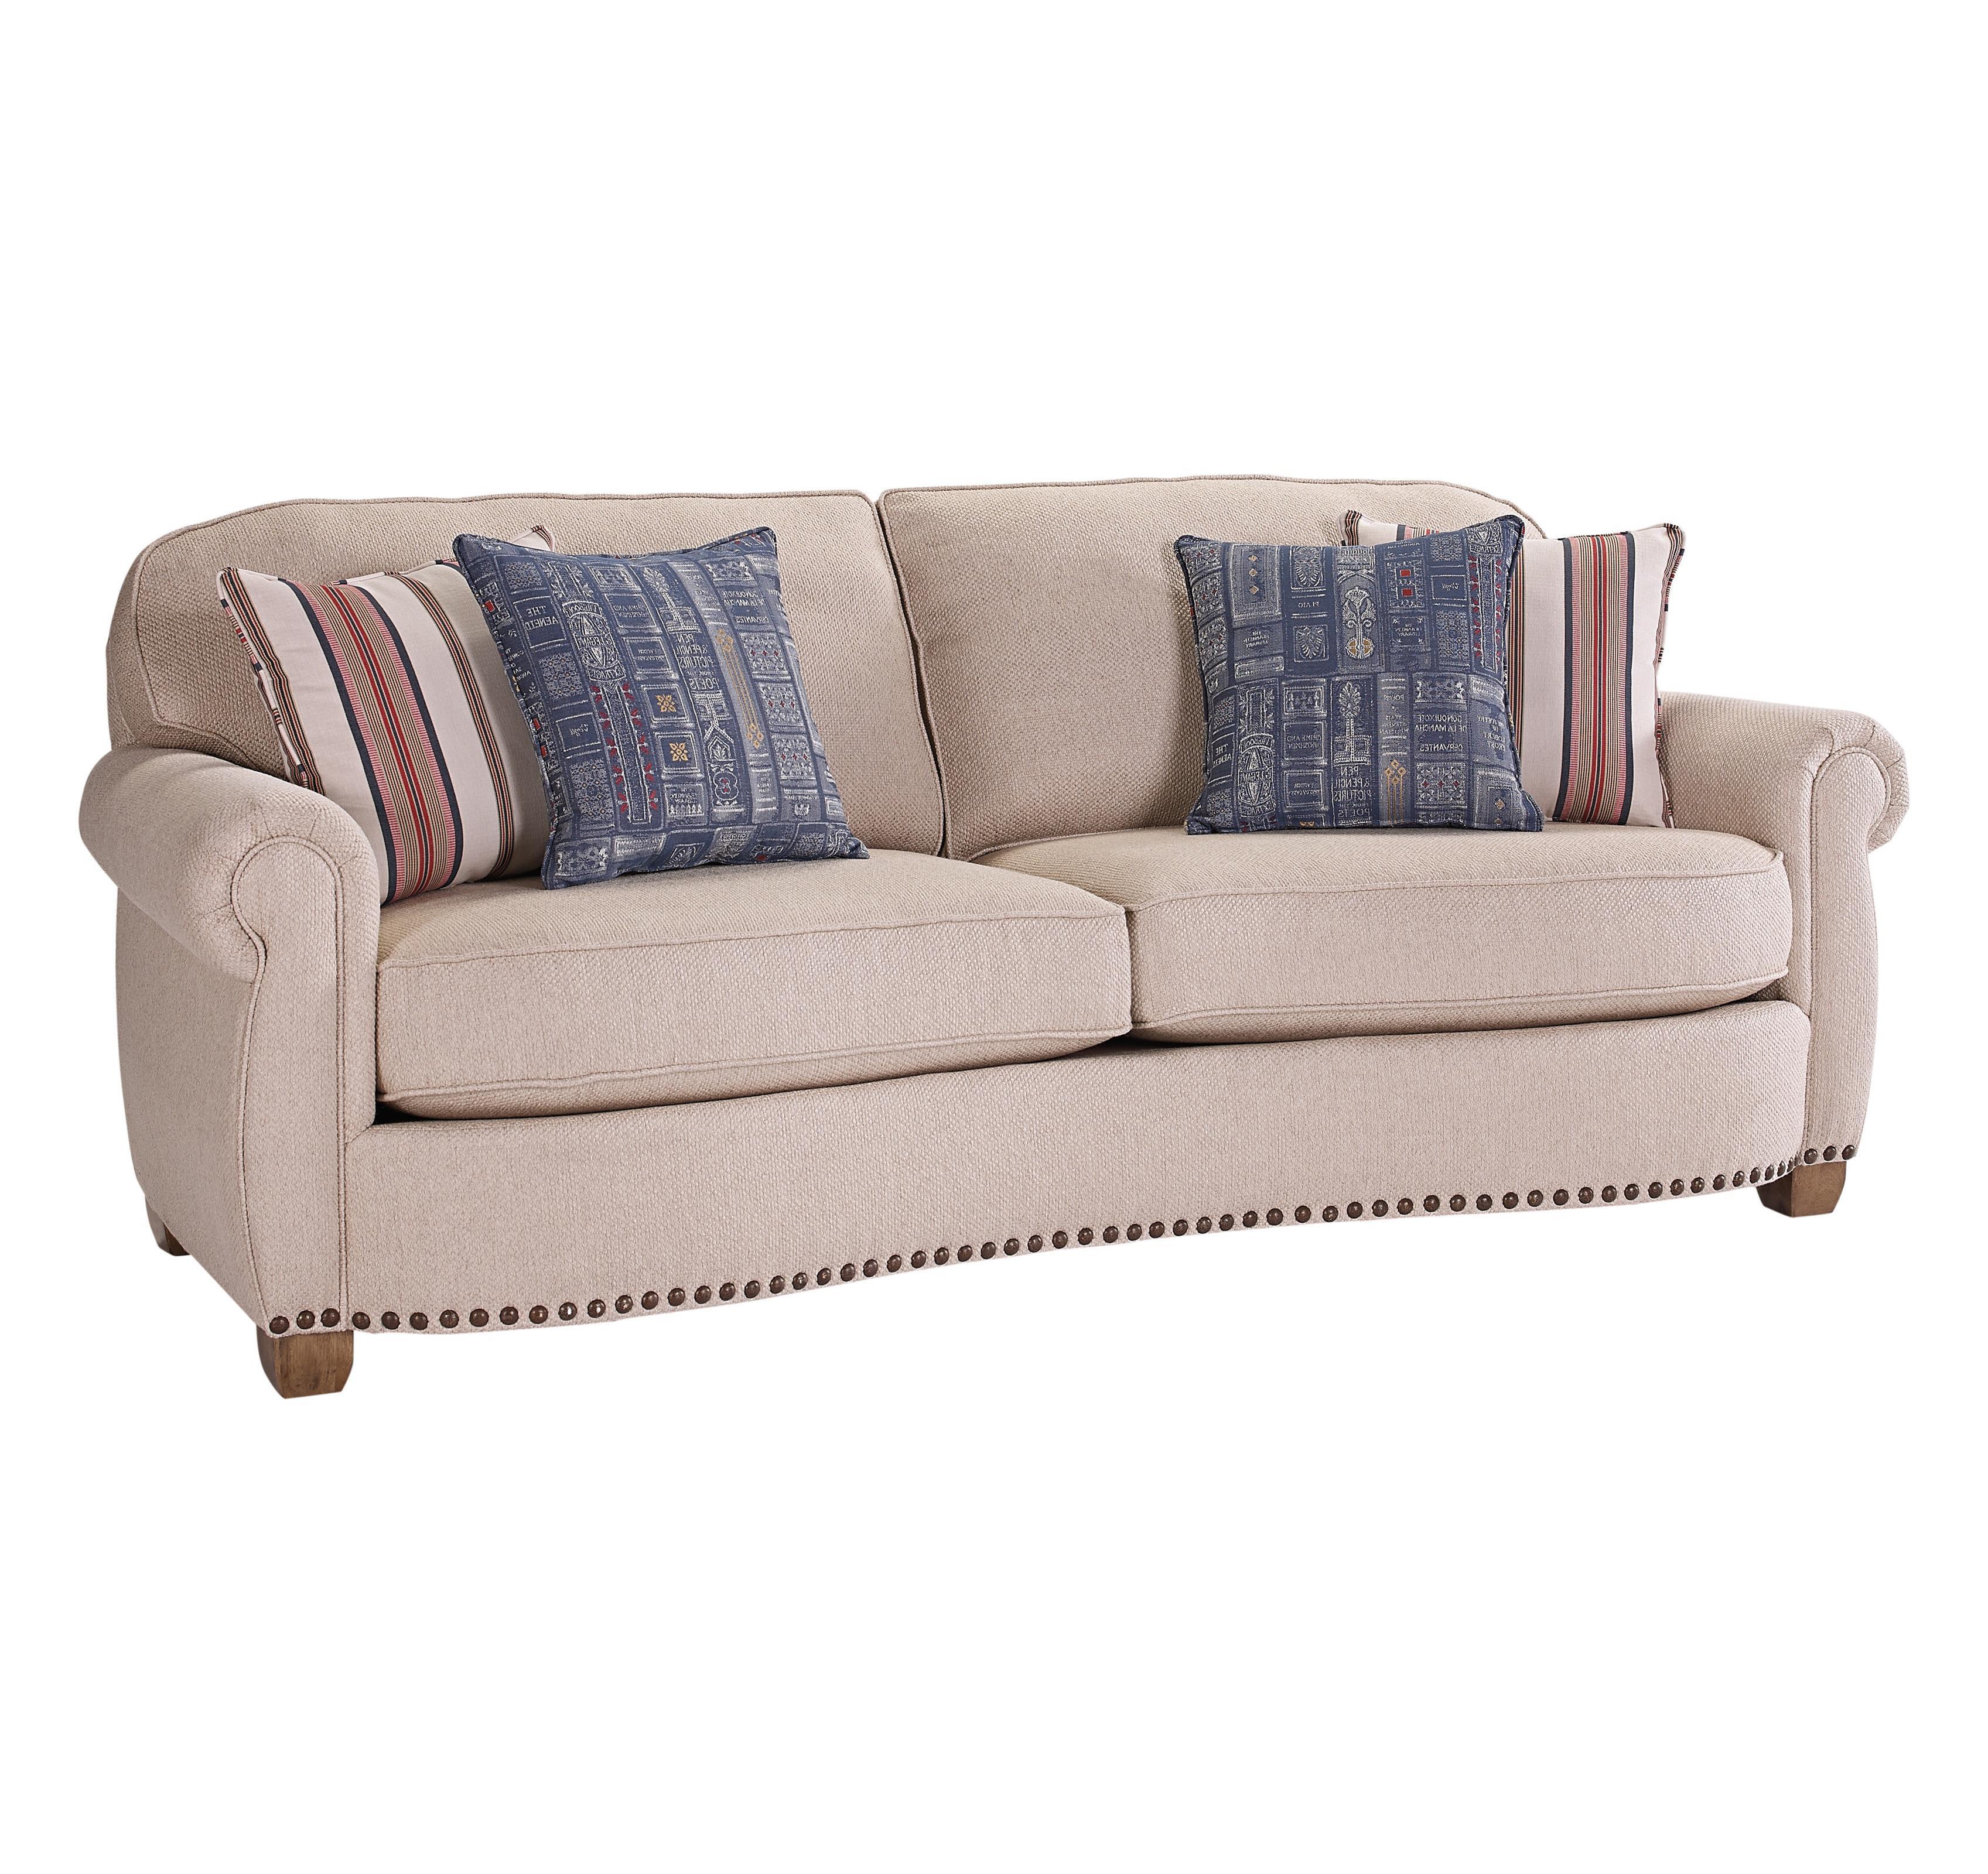 Broyhill Furniture New Vintage Sofa - Item Number: 4258-3-4242-80